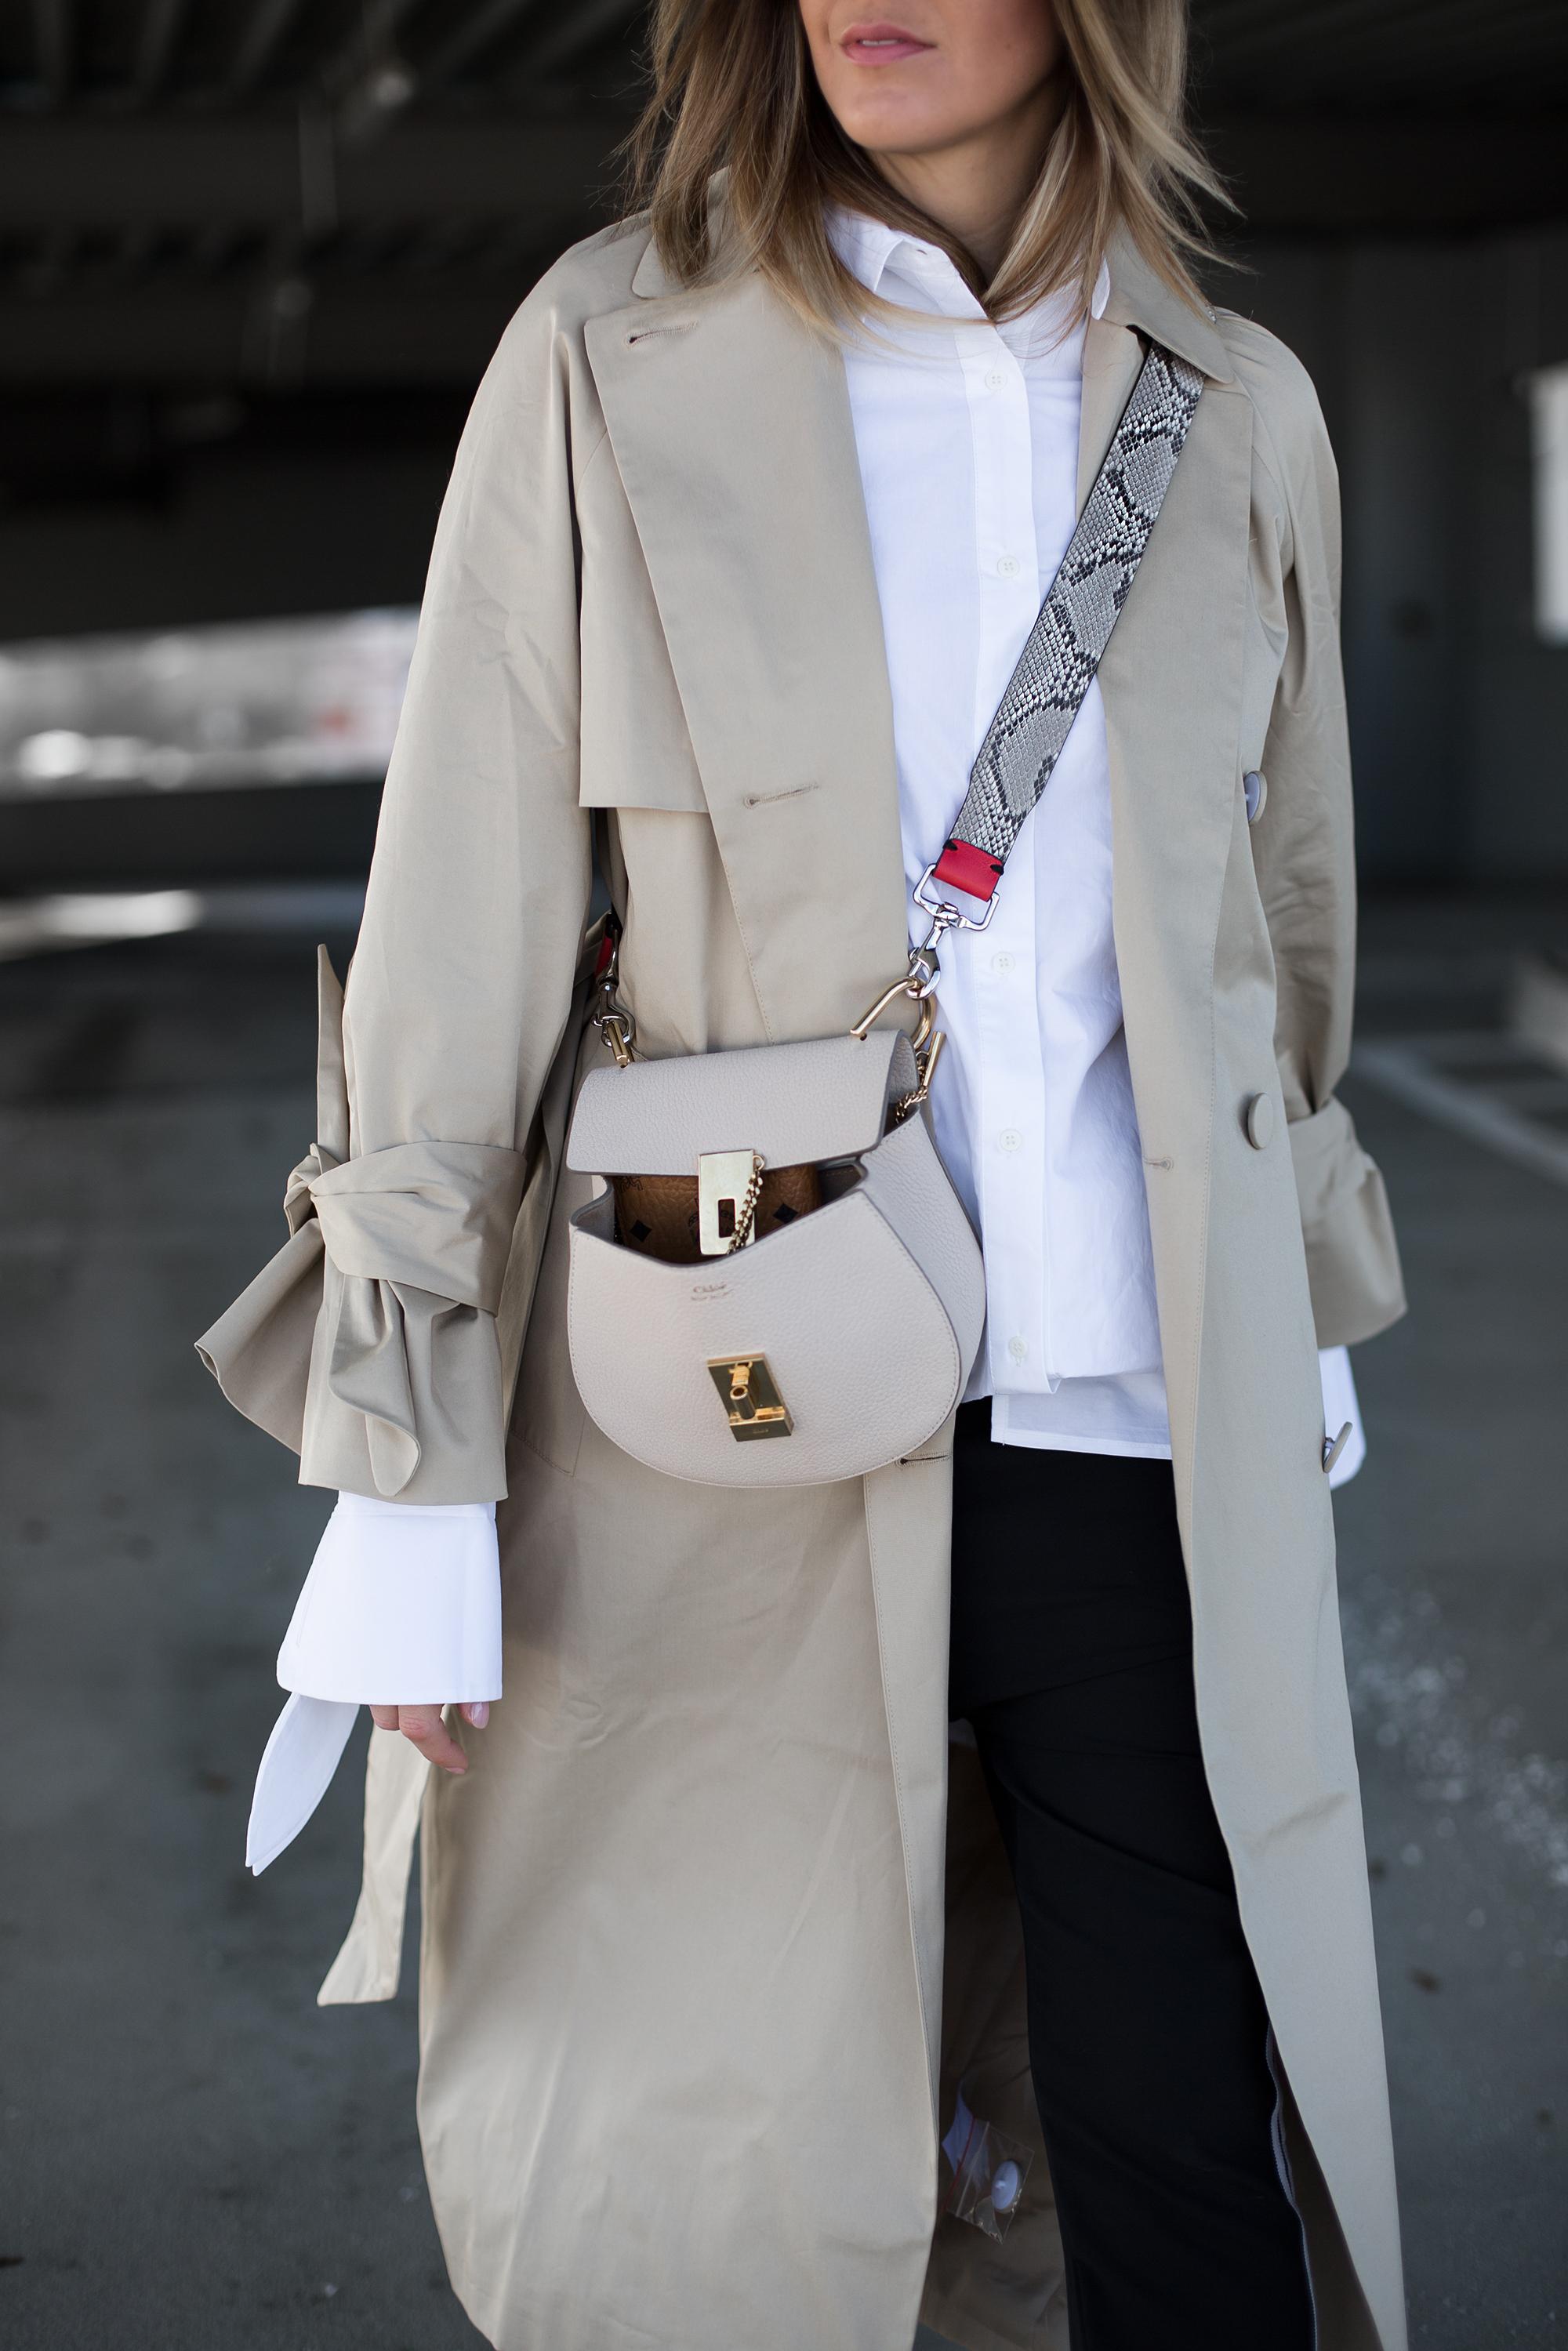 black-palms-fashionblog-streetstyle-gucci-princetown-chloe-drew-edited-trenchcoat-8